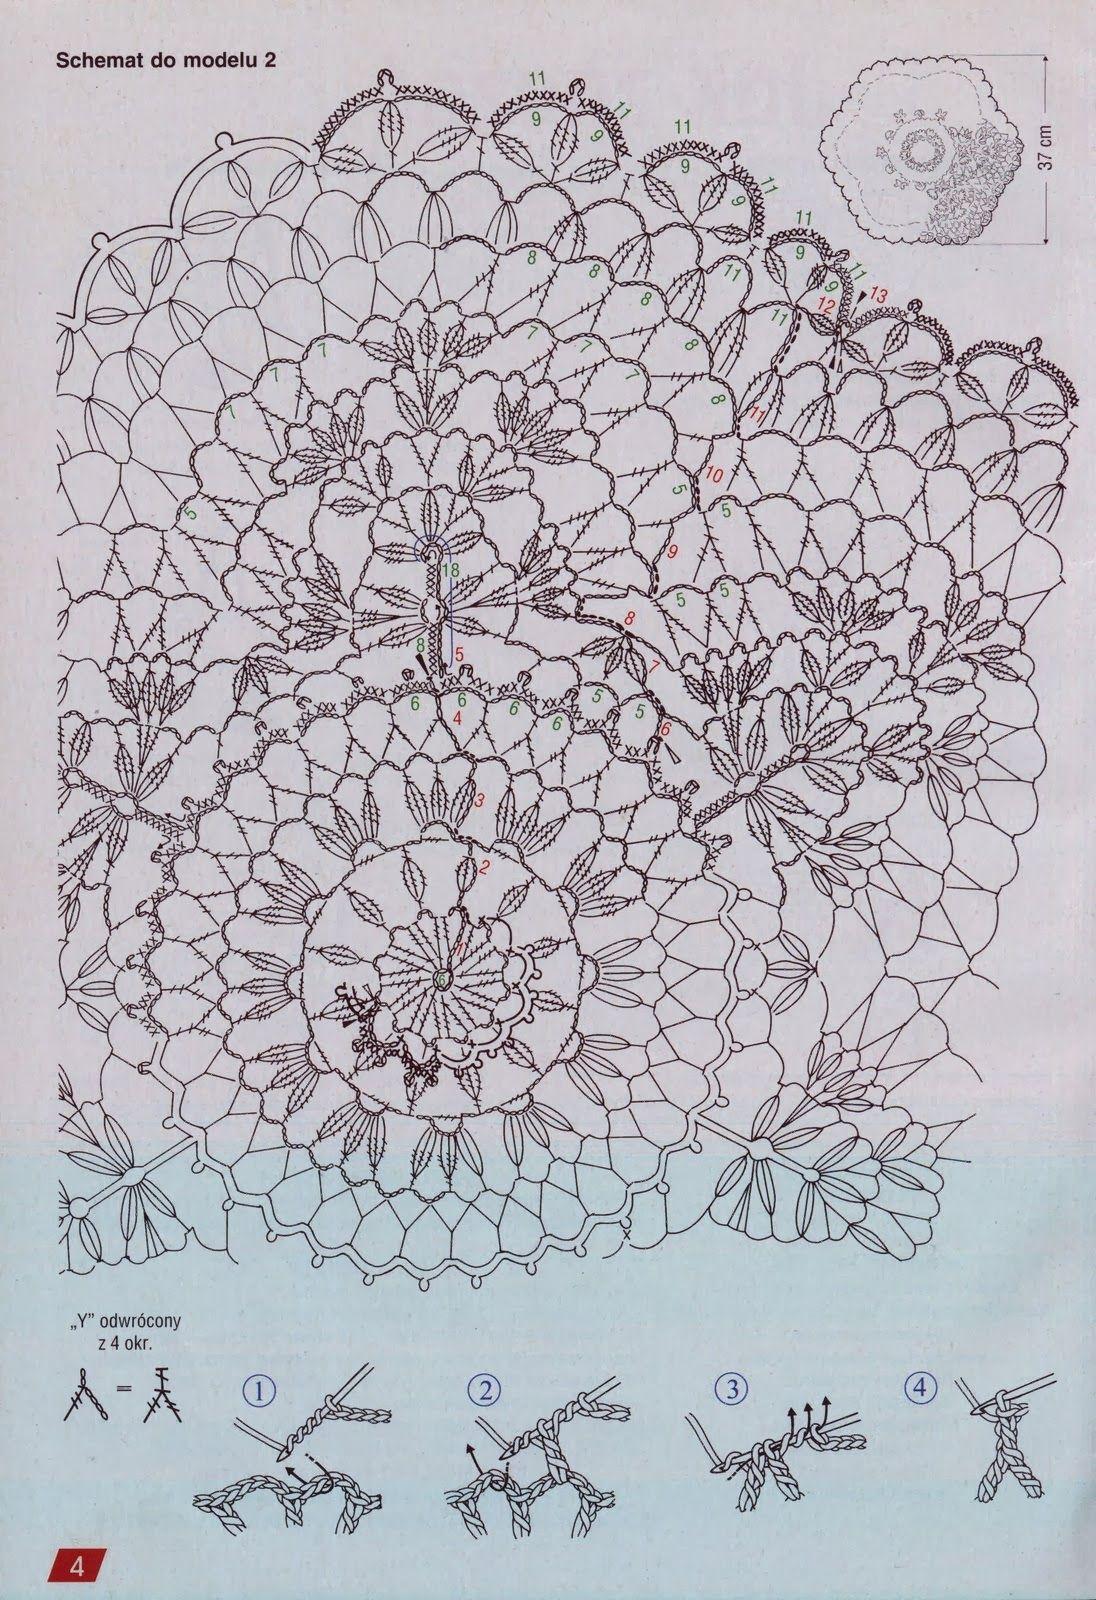 zizil pipilo: My works 6 | crochet - patterns and ideas | Pinterest ...